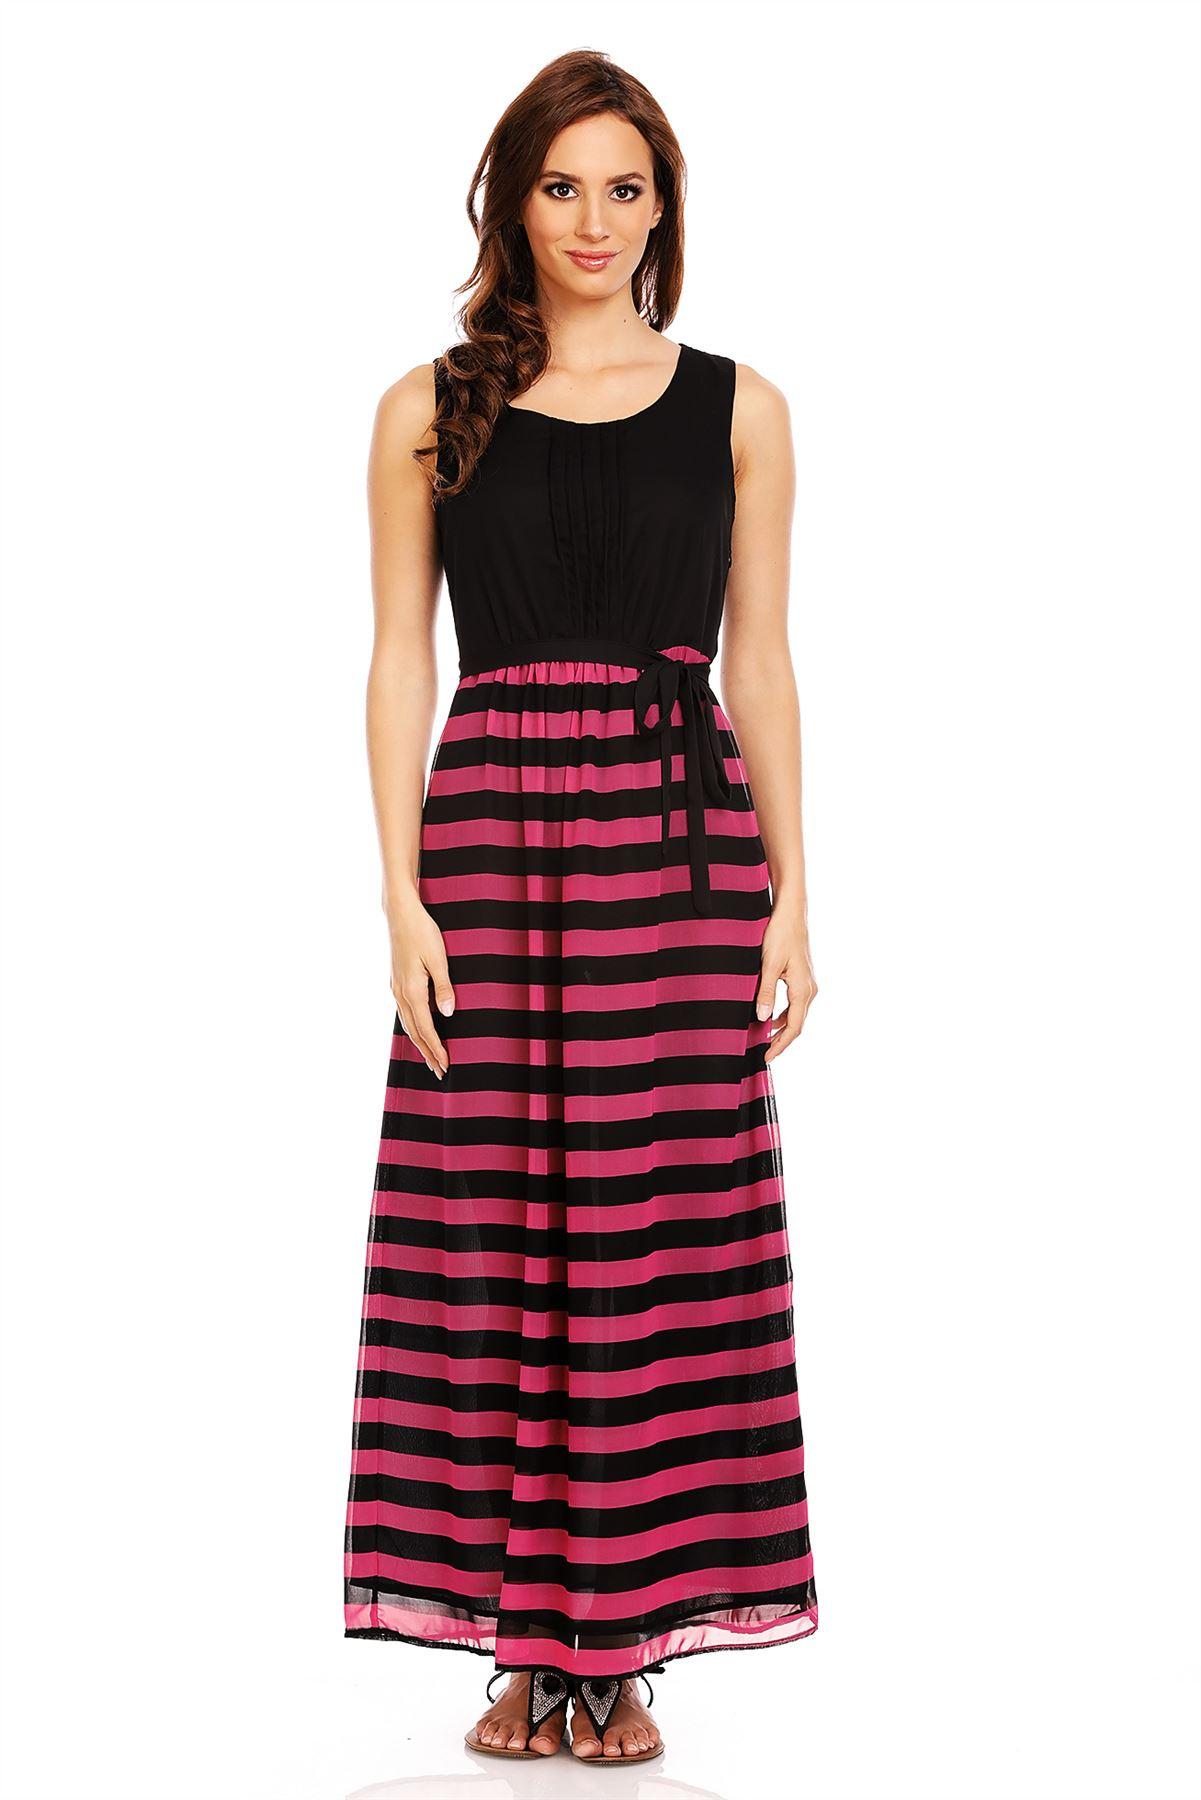 Perfect WOMENS LONG SLEEVE MAXI FULL LENGTH WRAP CROSSOVER DRESS SUMMER RESORT BEACH | EBay